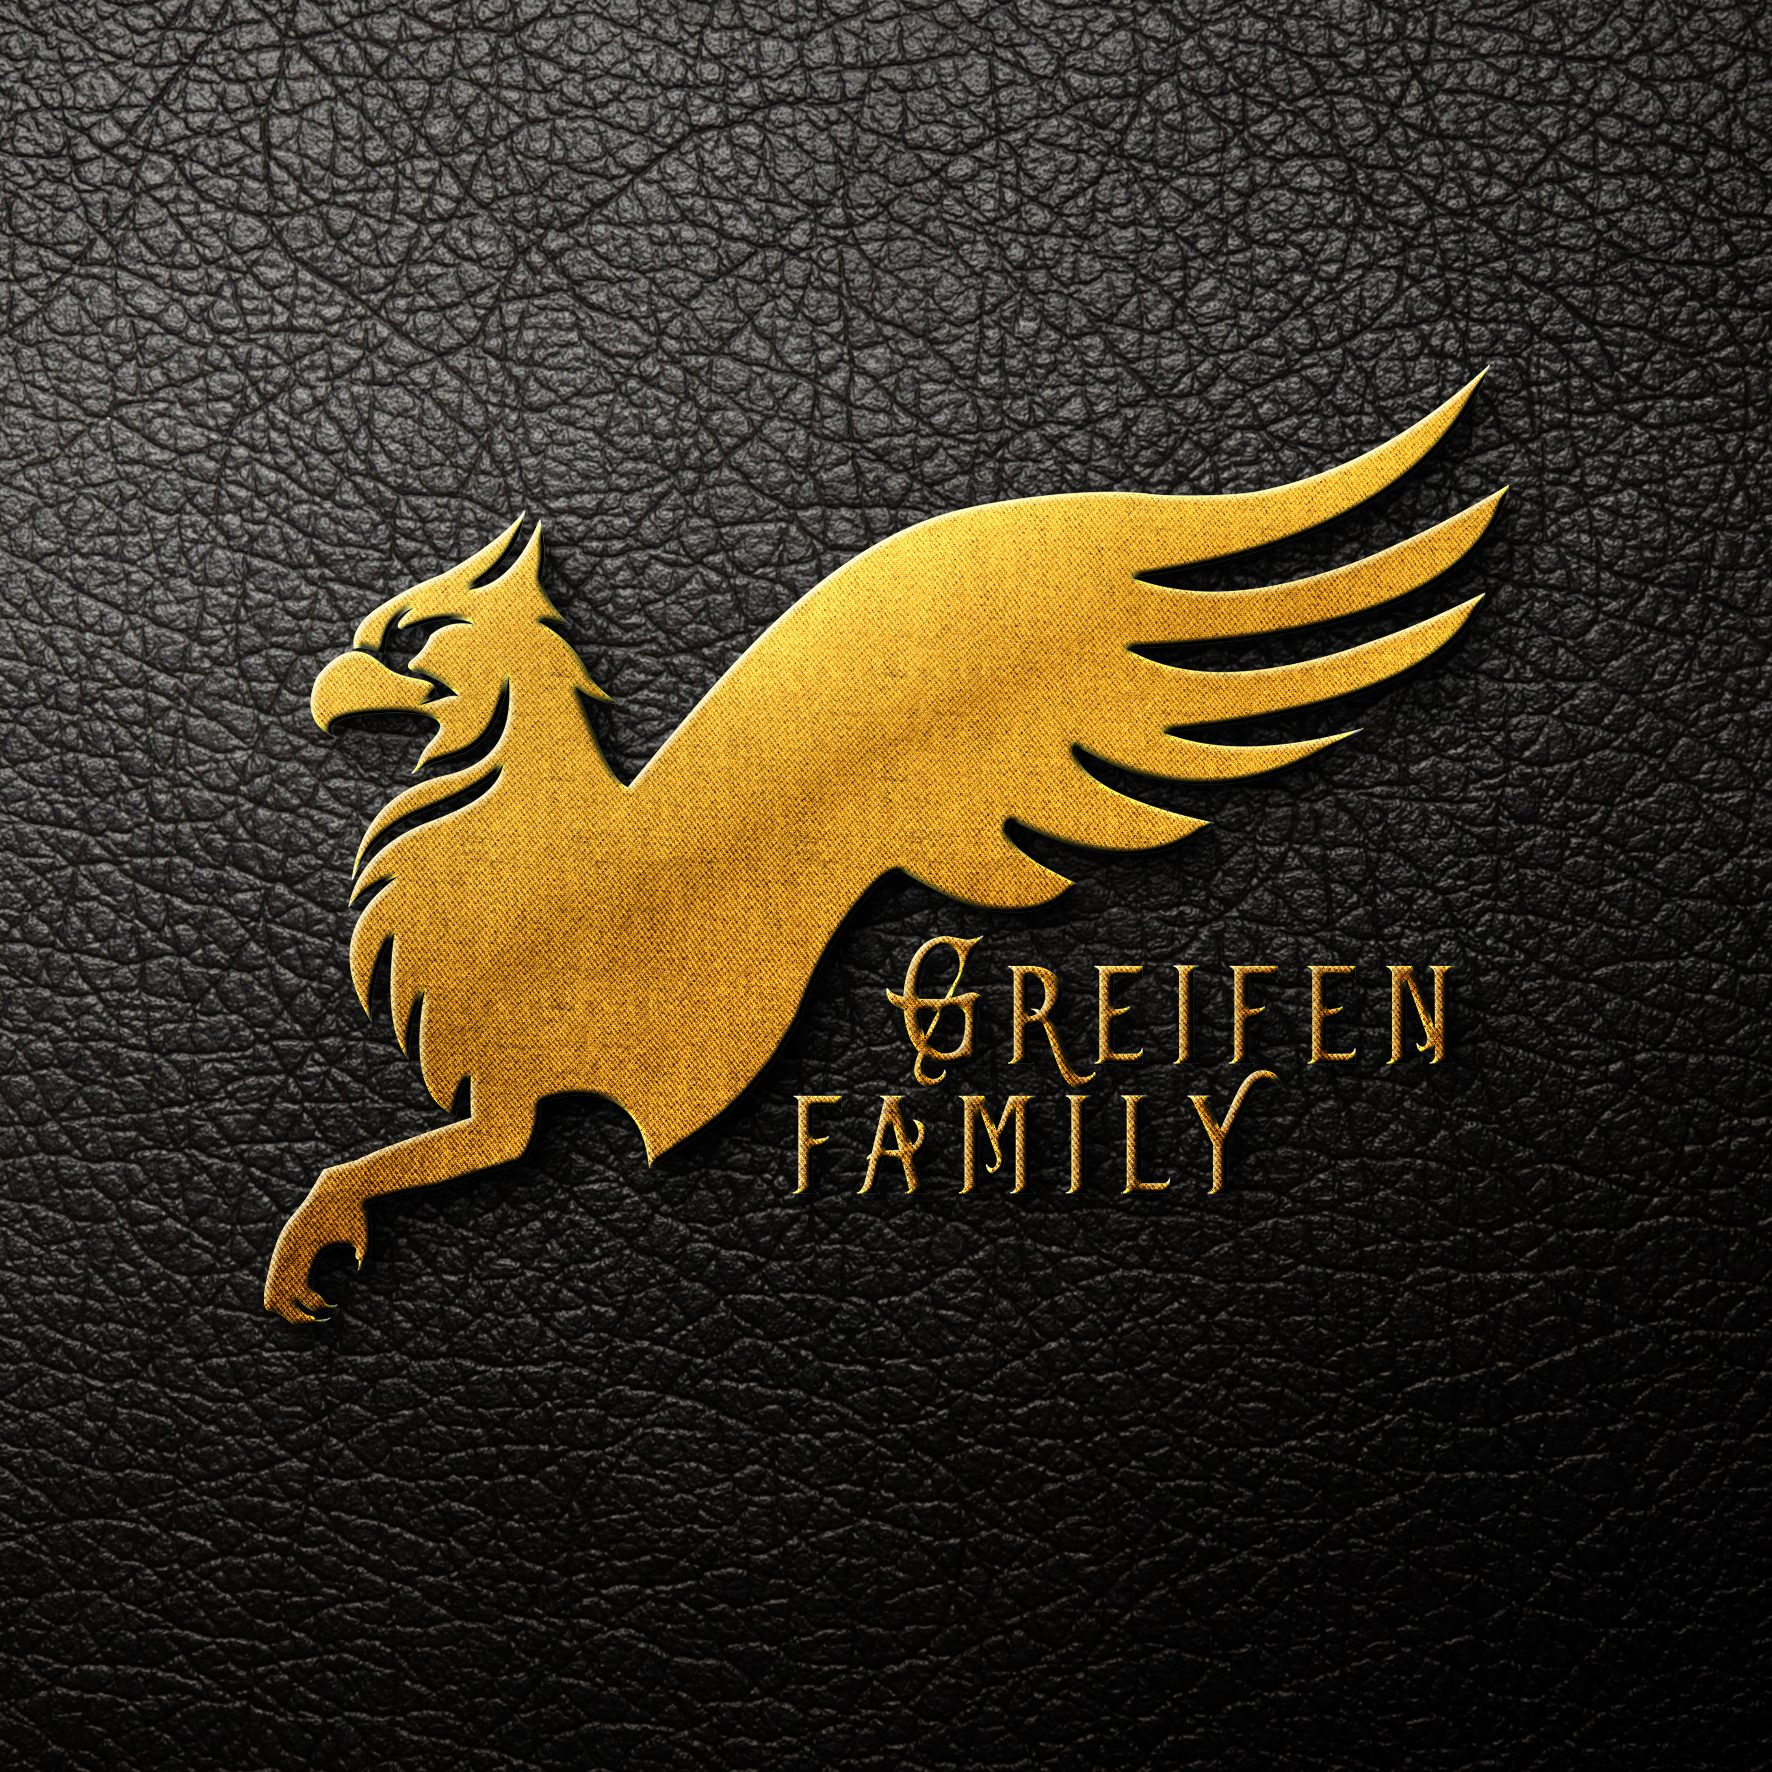 logo-mockup-with-gold-phoenix